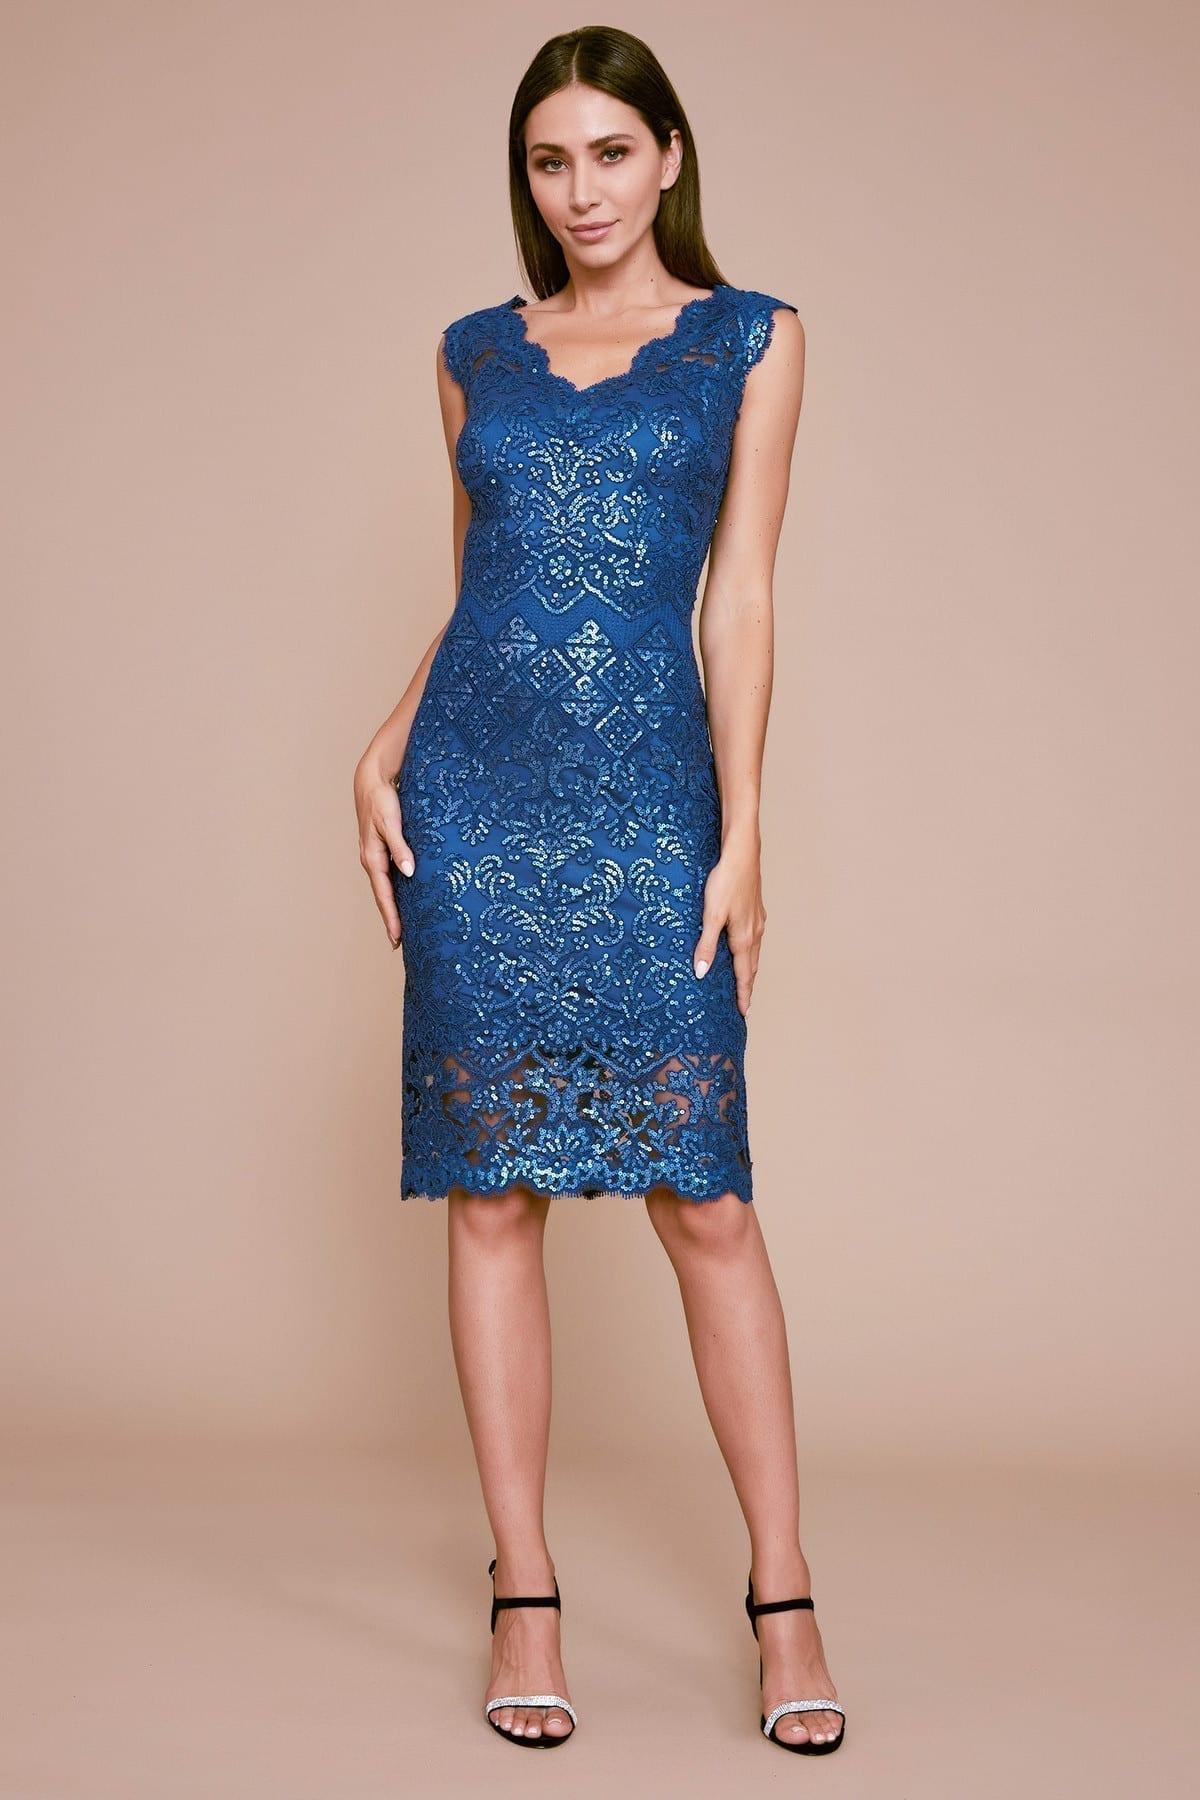 TADASHI SHOJI Ciarra Sleeveless Sequin Embroidered Dress